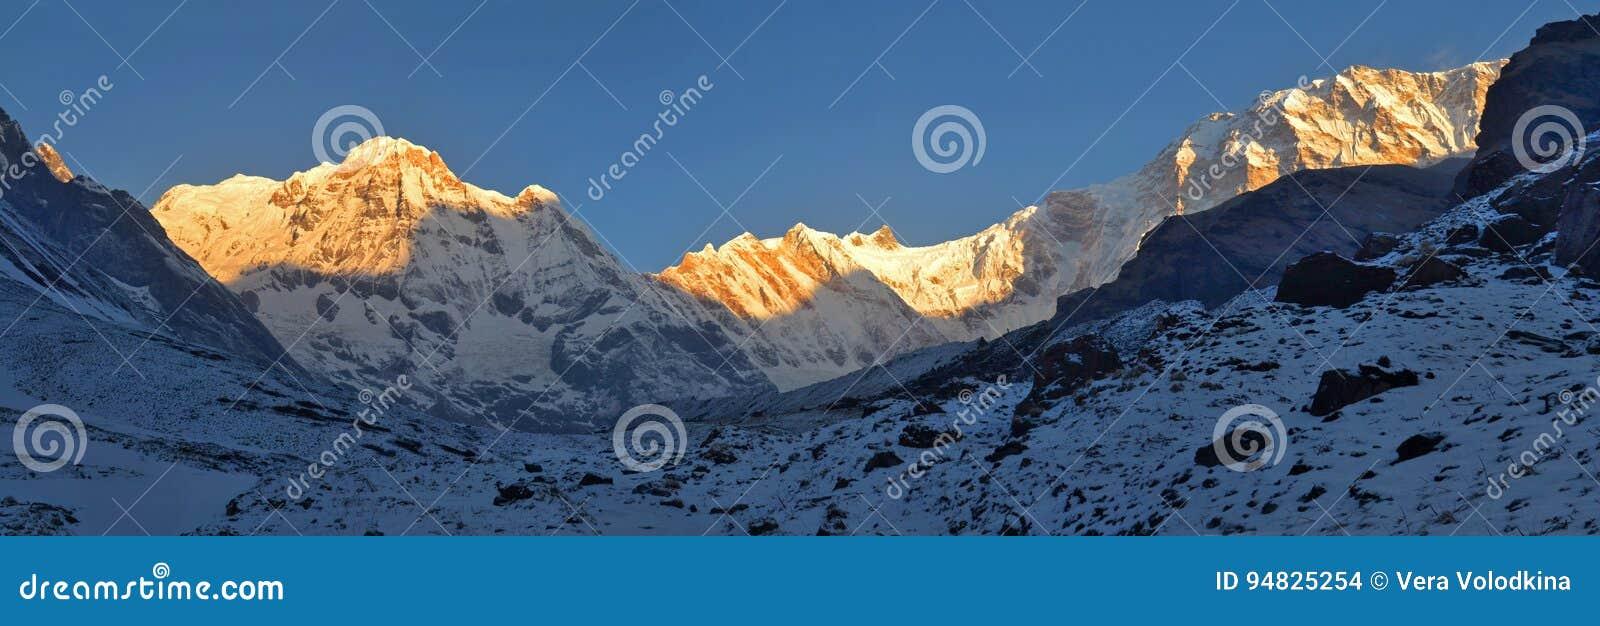 Snowy Landscape Panorama in Himalaya Mountains. Sunrise Annapurna South peak, Annapurna Base Camp .